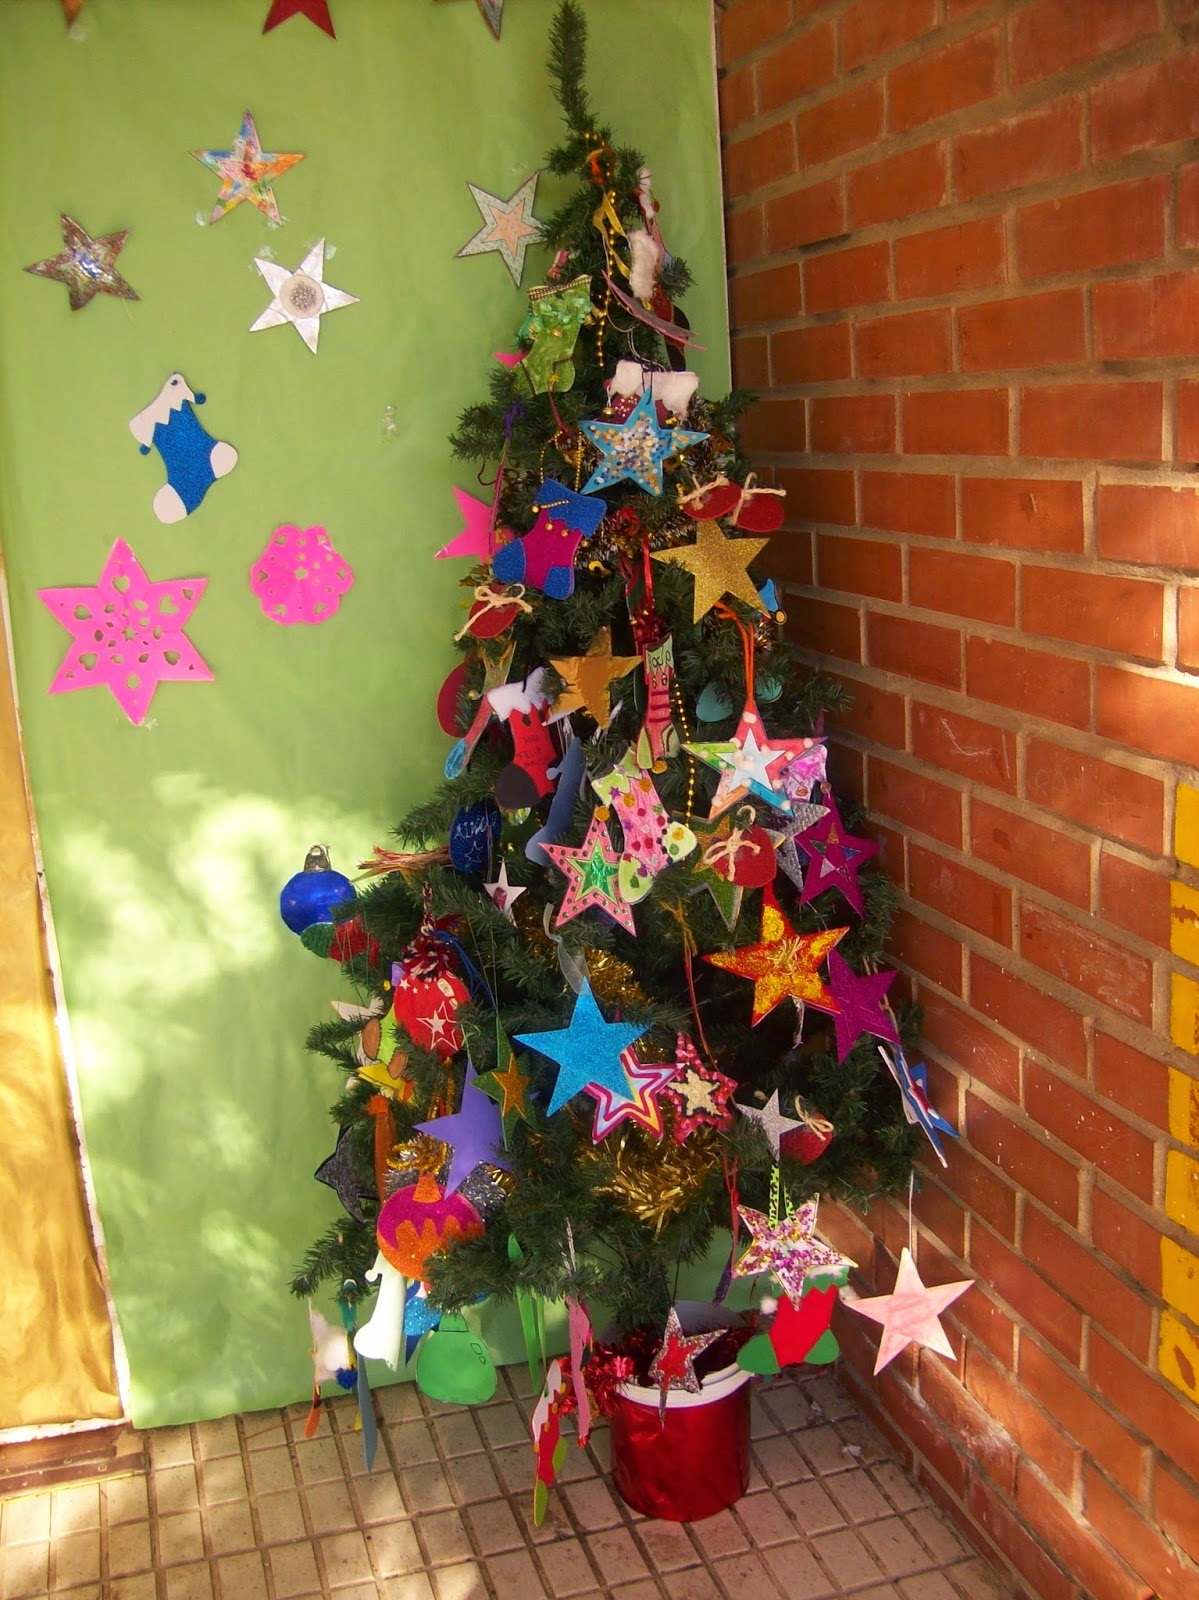 Educaci n infantil ceip padre manjon nuestra ambientaci n for Ambientacion para navidad